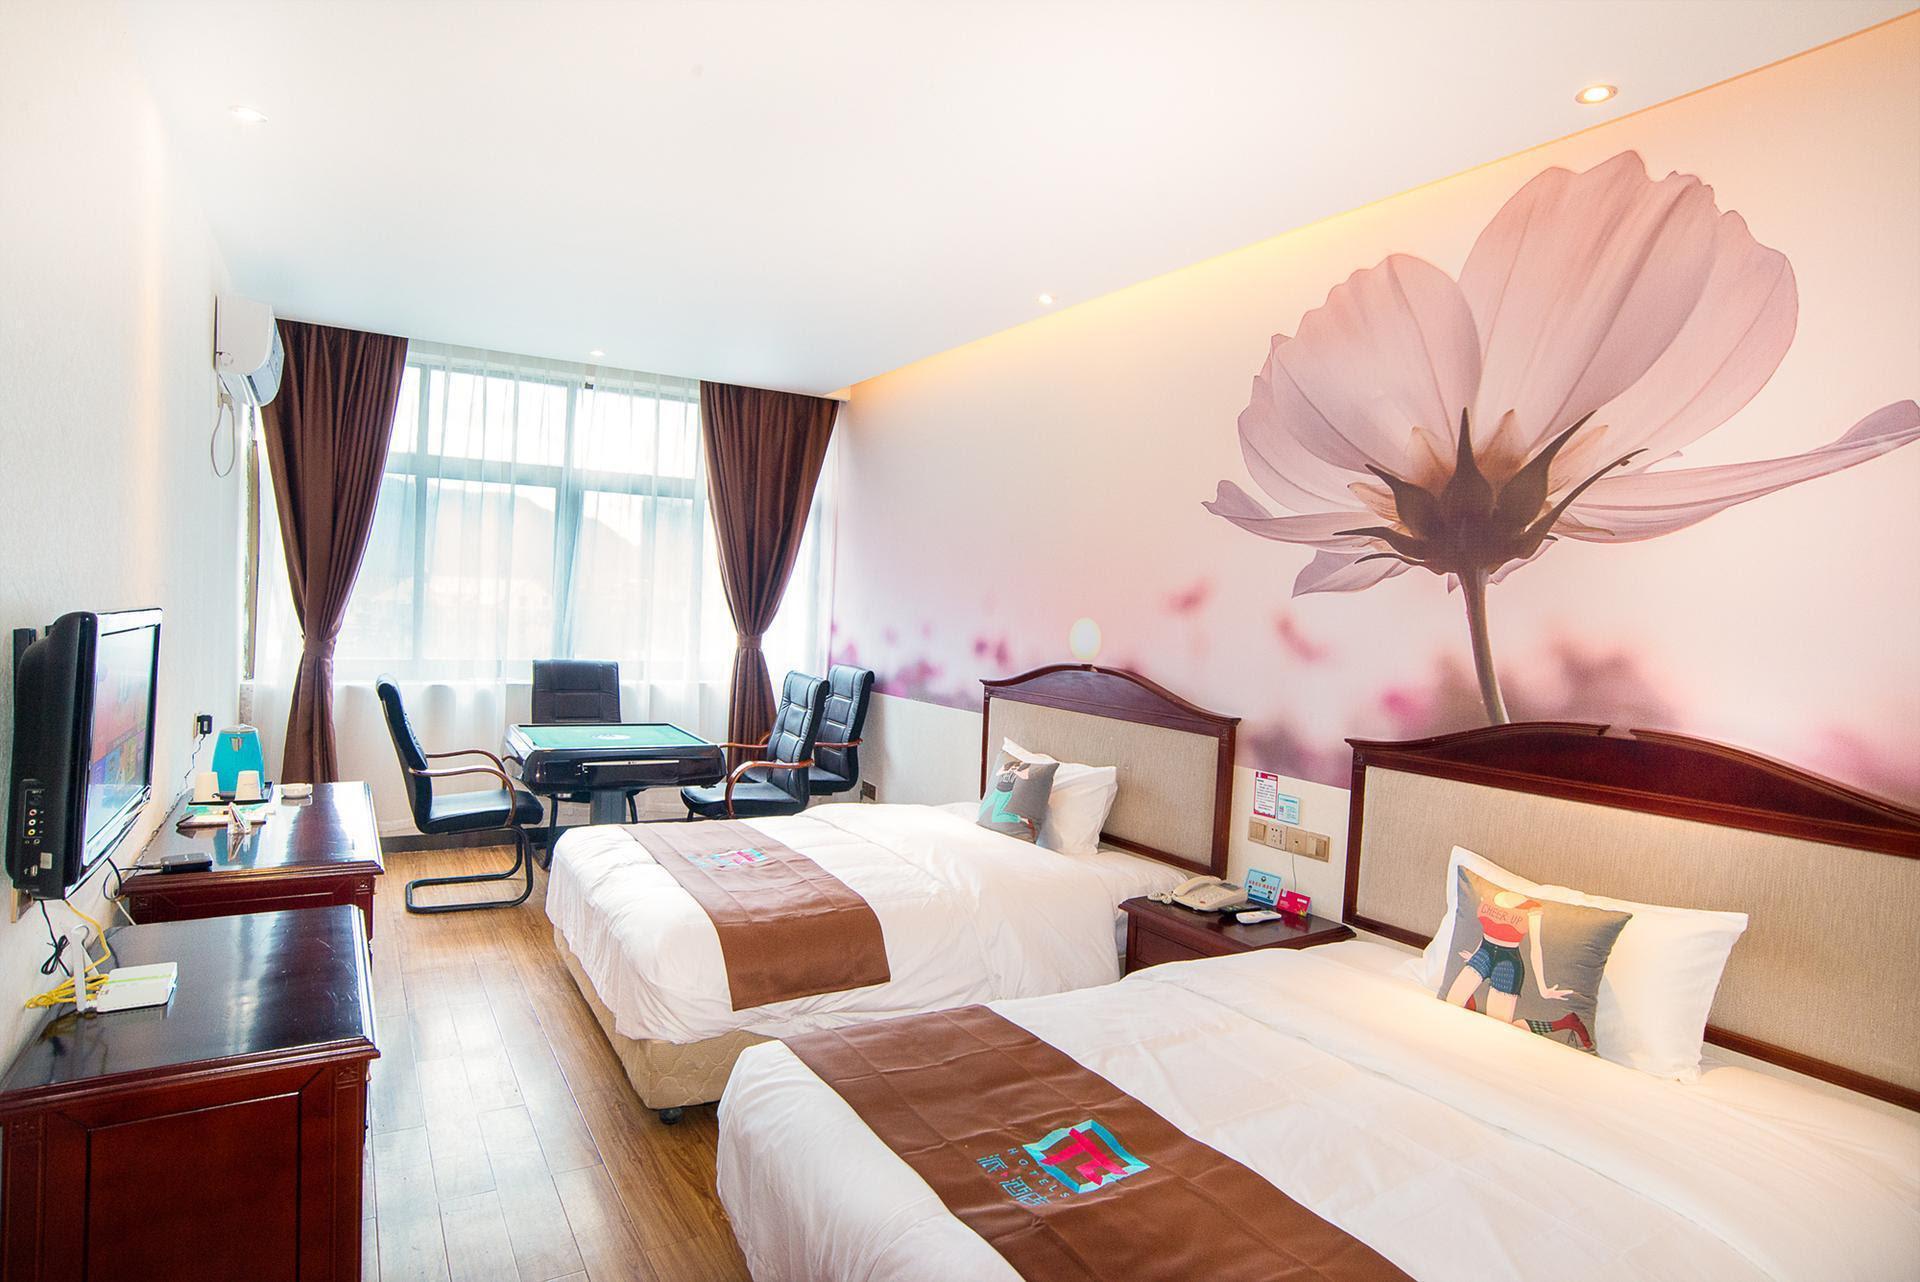 Pai Hotel Xi'an North Sanhuan Daming Palace Building Materials Market Reviews